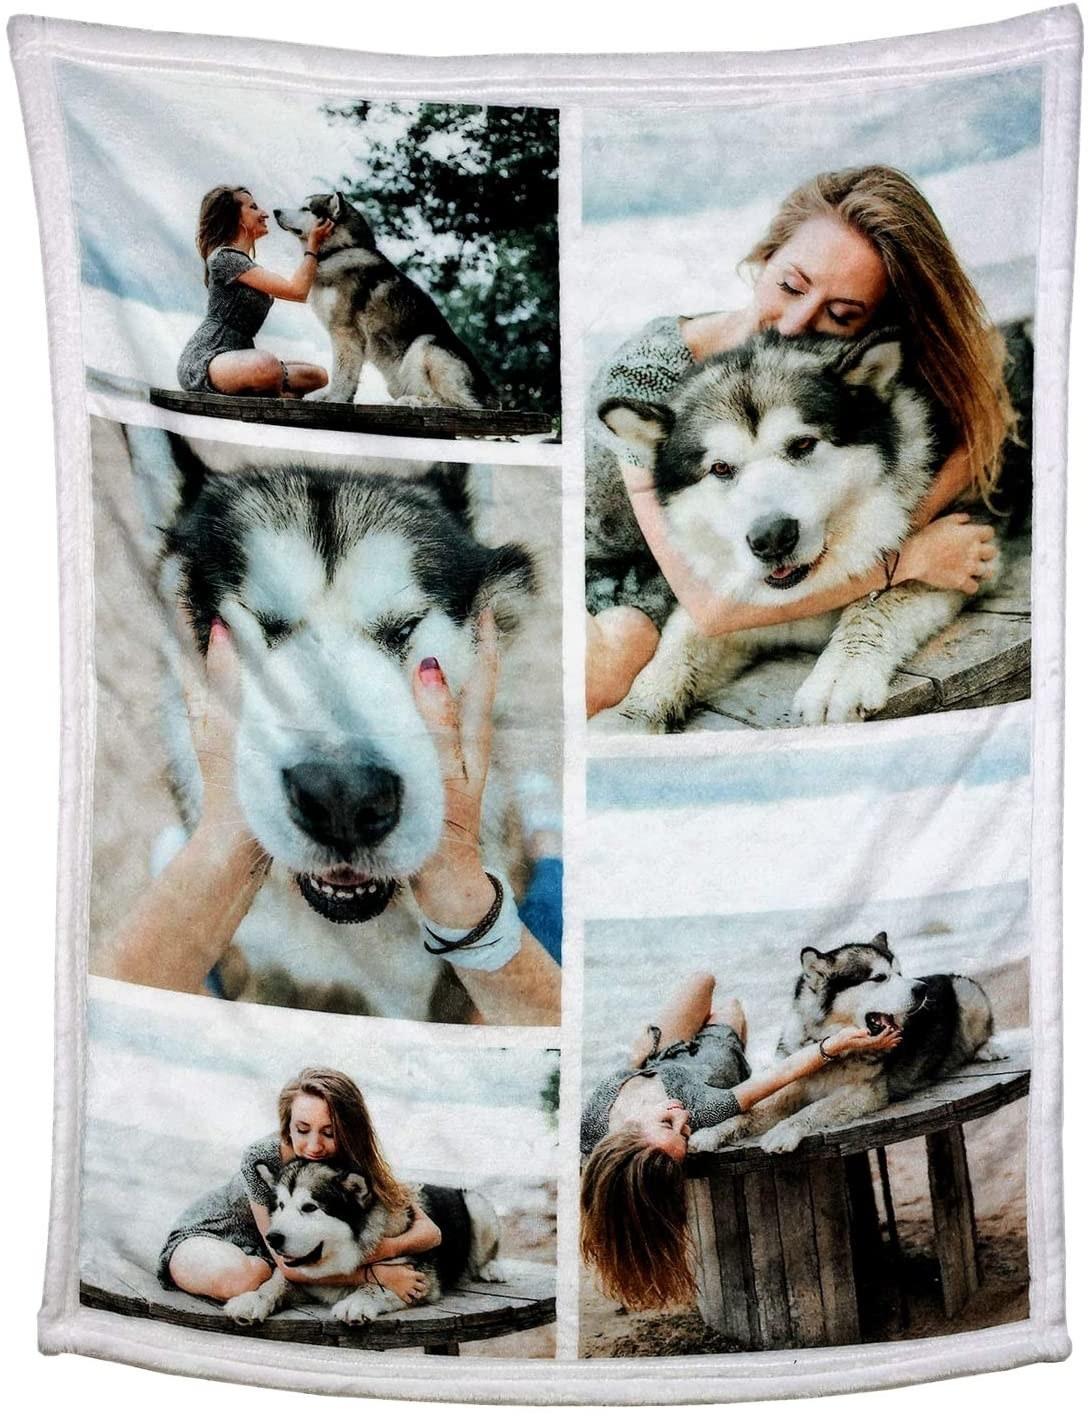 The custom photo blanket